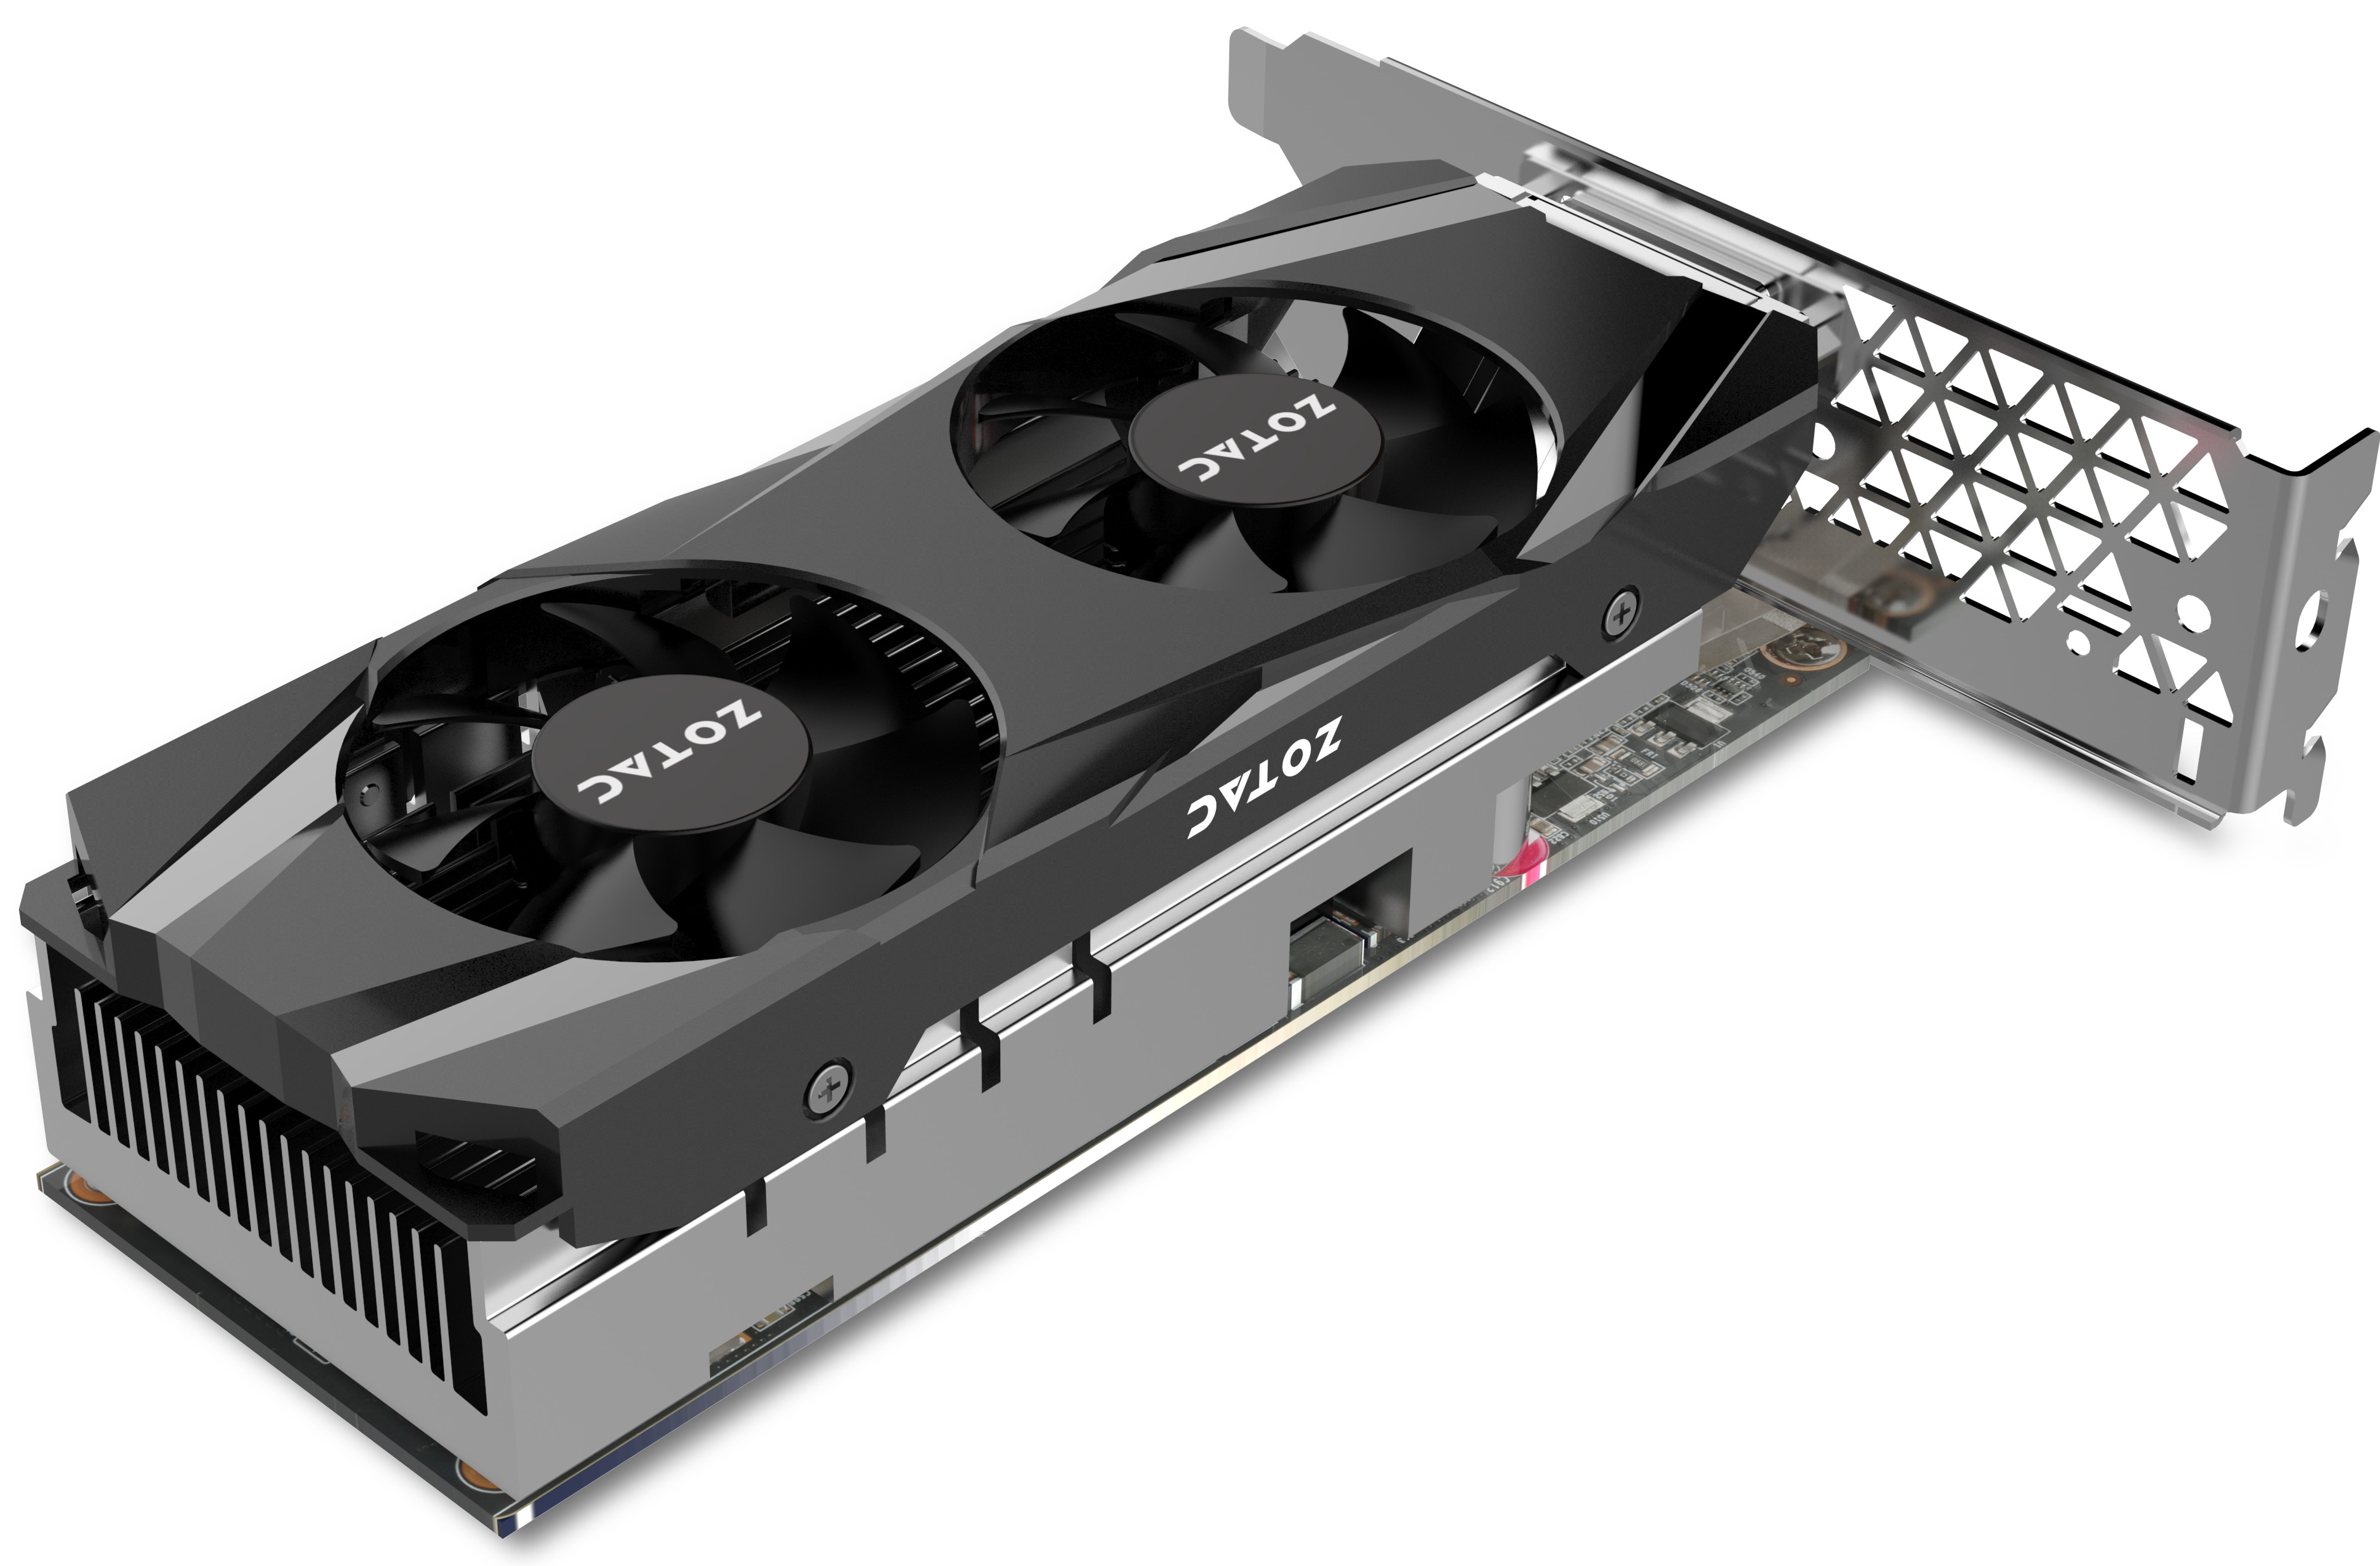 ZOTAC Intros Low-profile GeForce GTX 1050 Ti and GTX 1050 ...